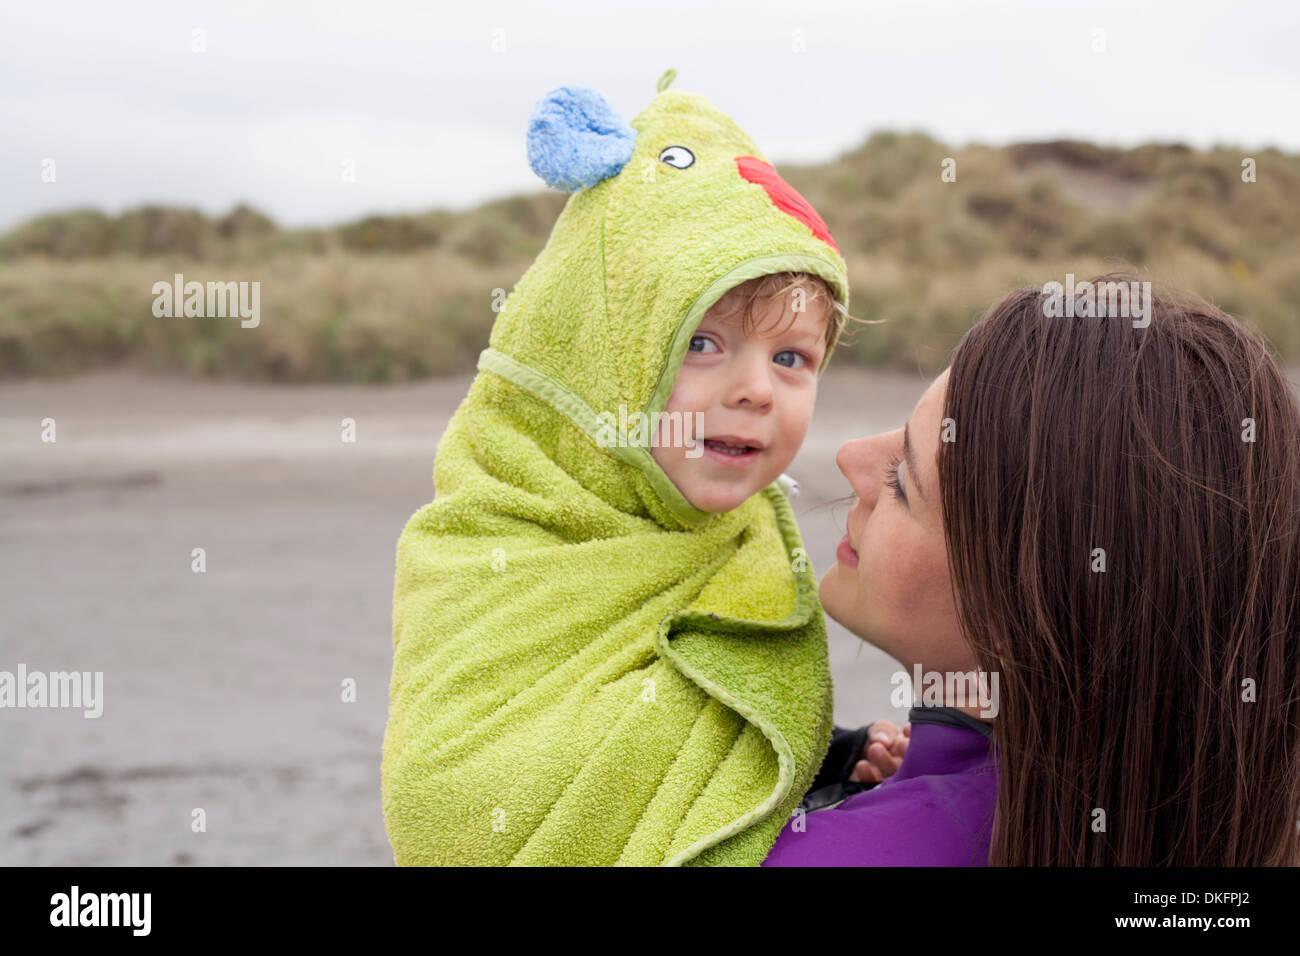 Portrait de mère fils holding wrapped in a towel Photo Stock